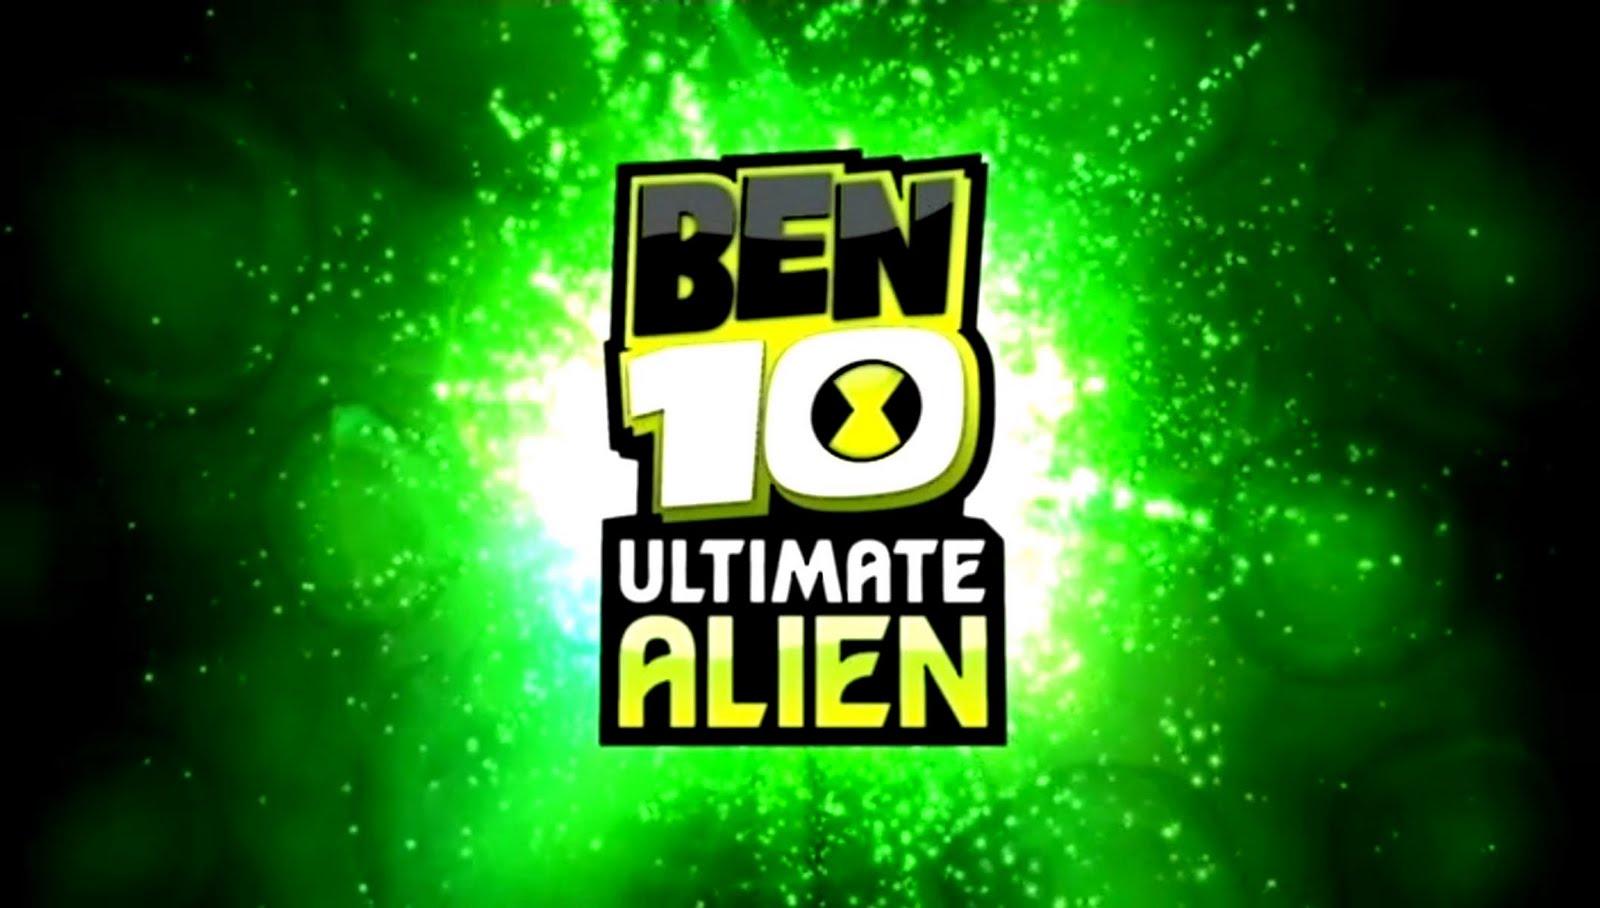 http://1.bp.blogspot.com/-wYgRKL1tXAU/Tm4KWwpZFqI/AAAAAAAAC8M/a7Hvd0BUBE4/s1600/Ben_10_Ultimate_Alien_Logo_HD_Wallpaper_www.Vvallpaper.Net.jpg